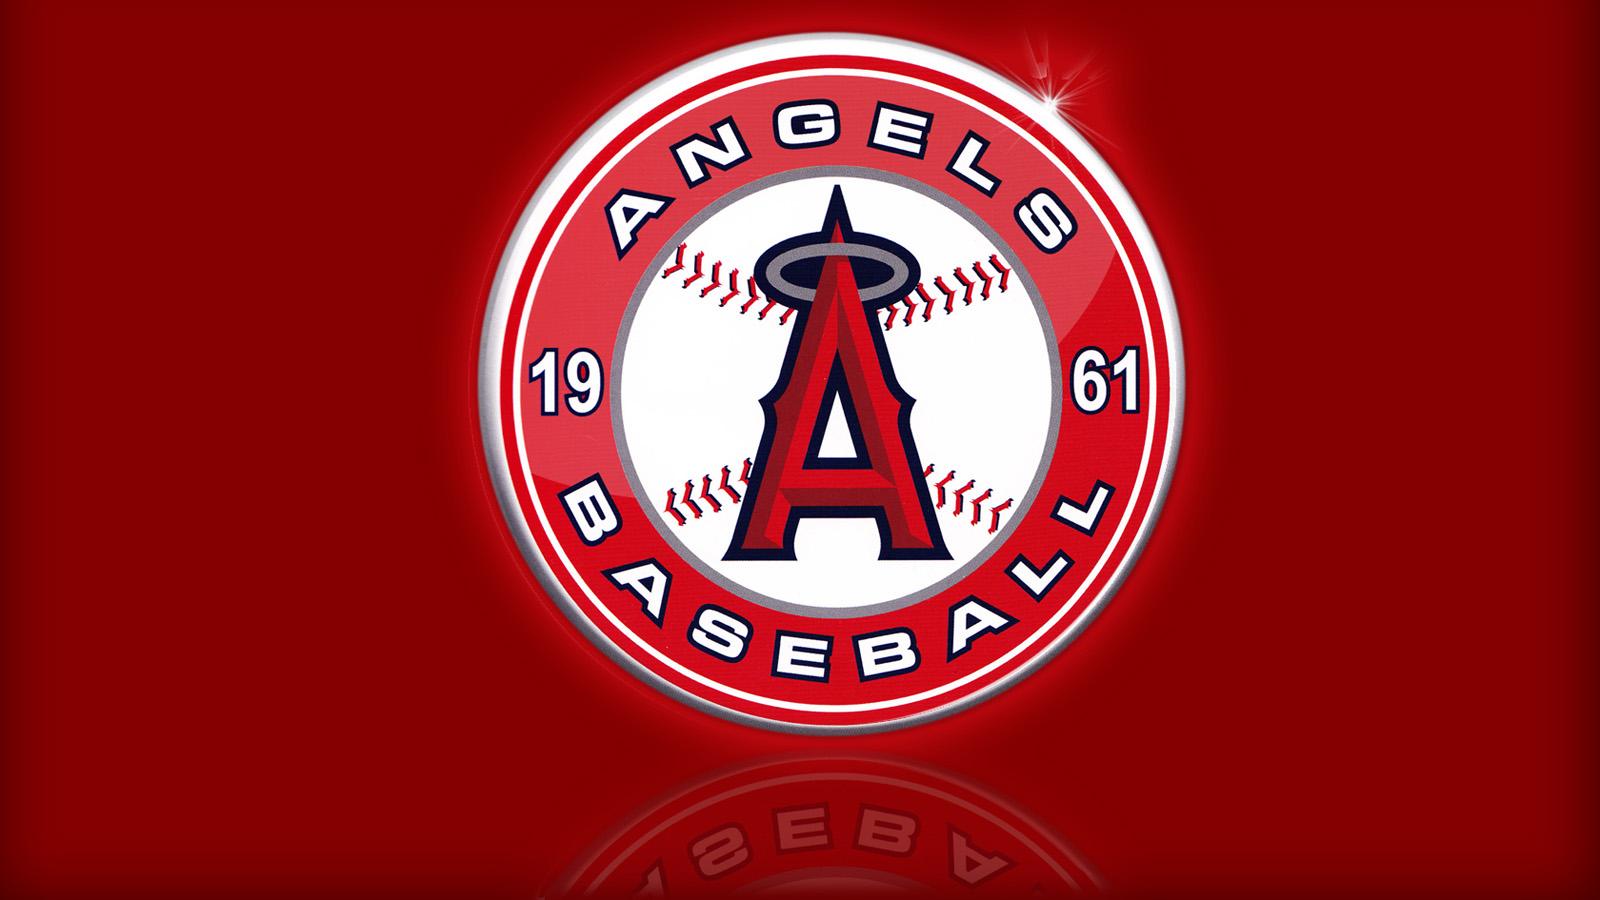 Angels of Anaheim wallpaper Los Angeles Angels of Anaheim wallpapers 1600x900